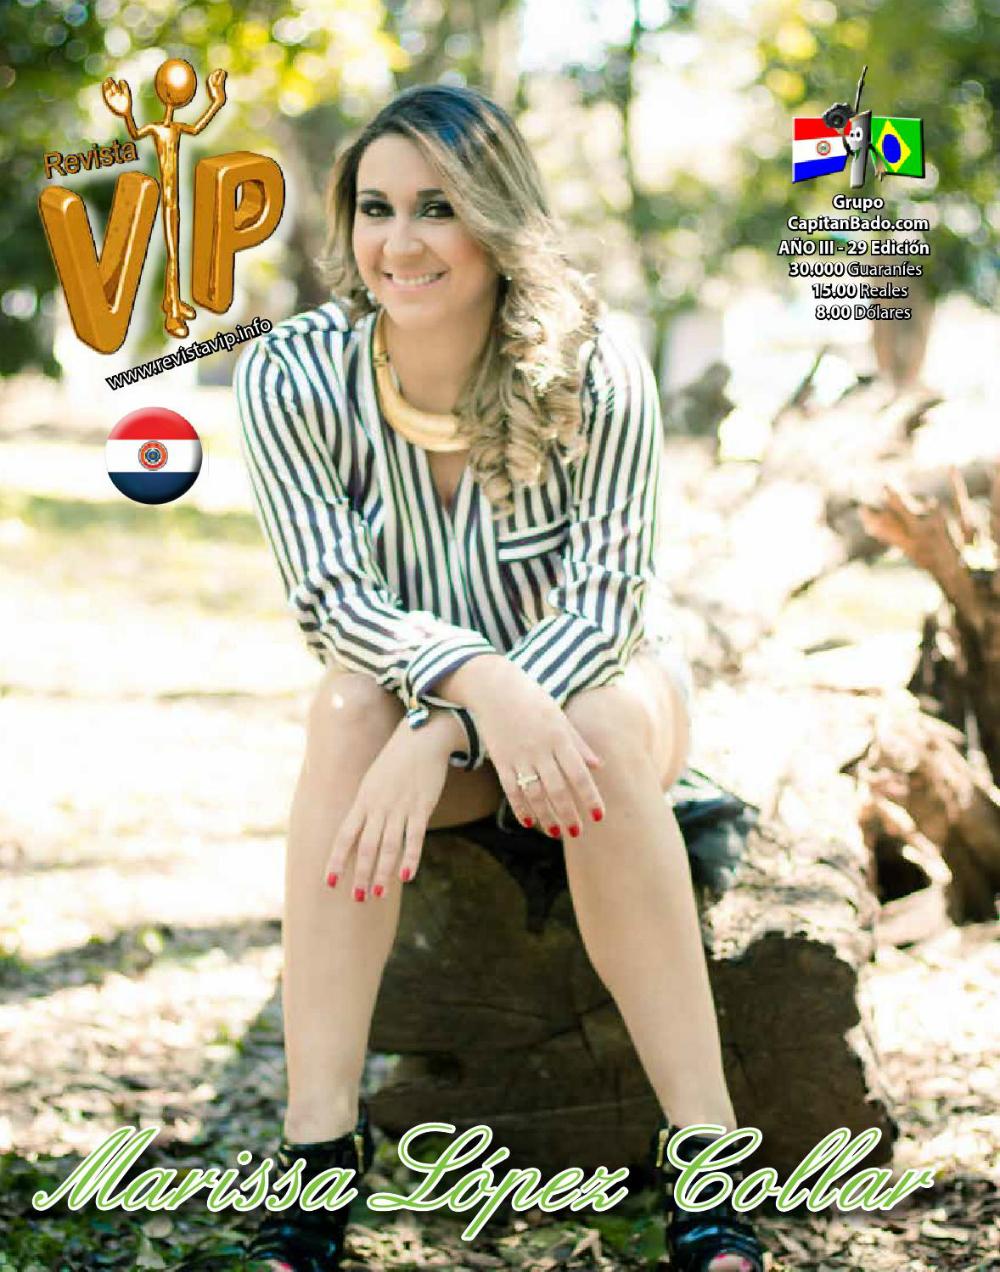 Vip 29 Paraguay